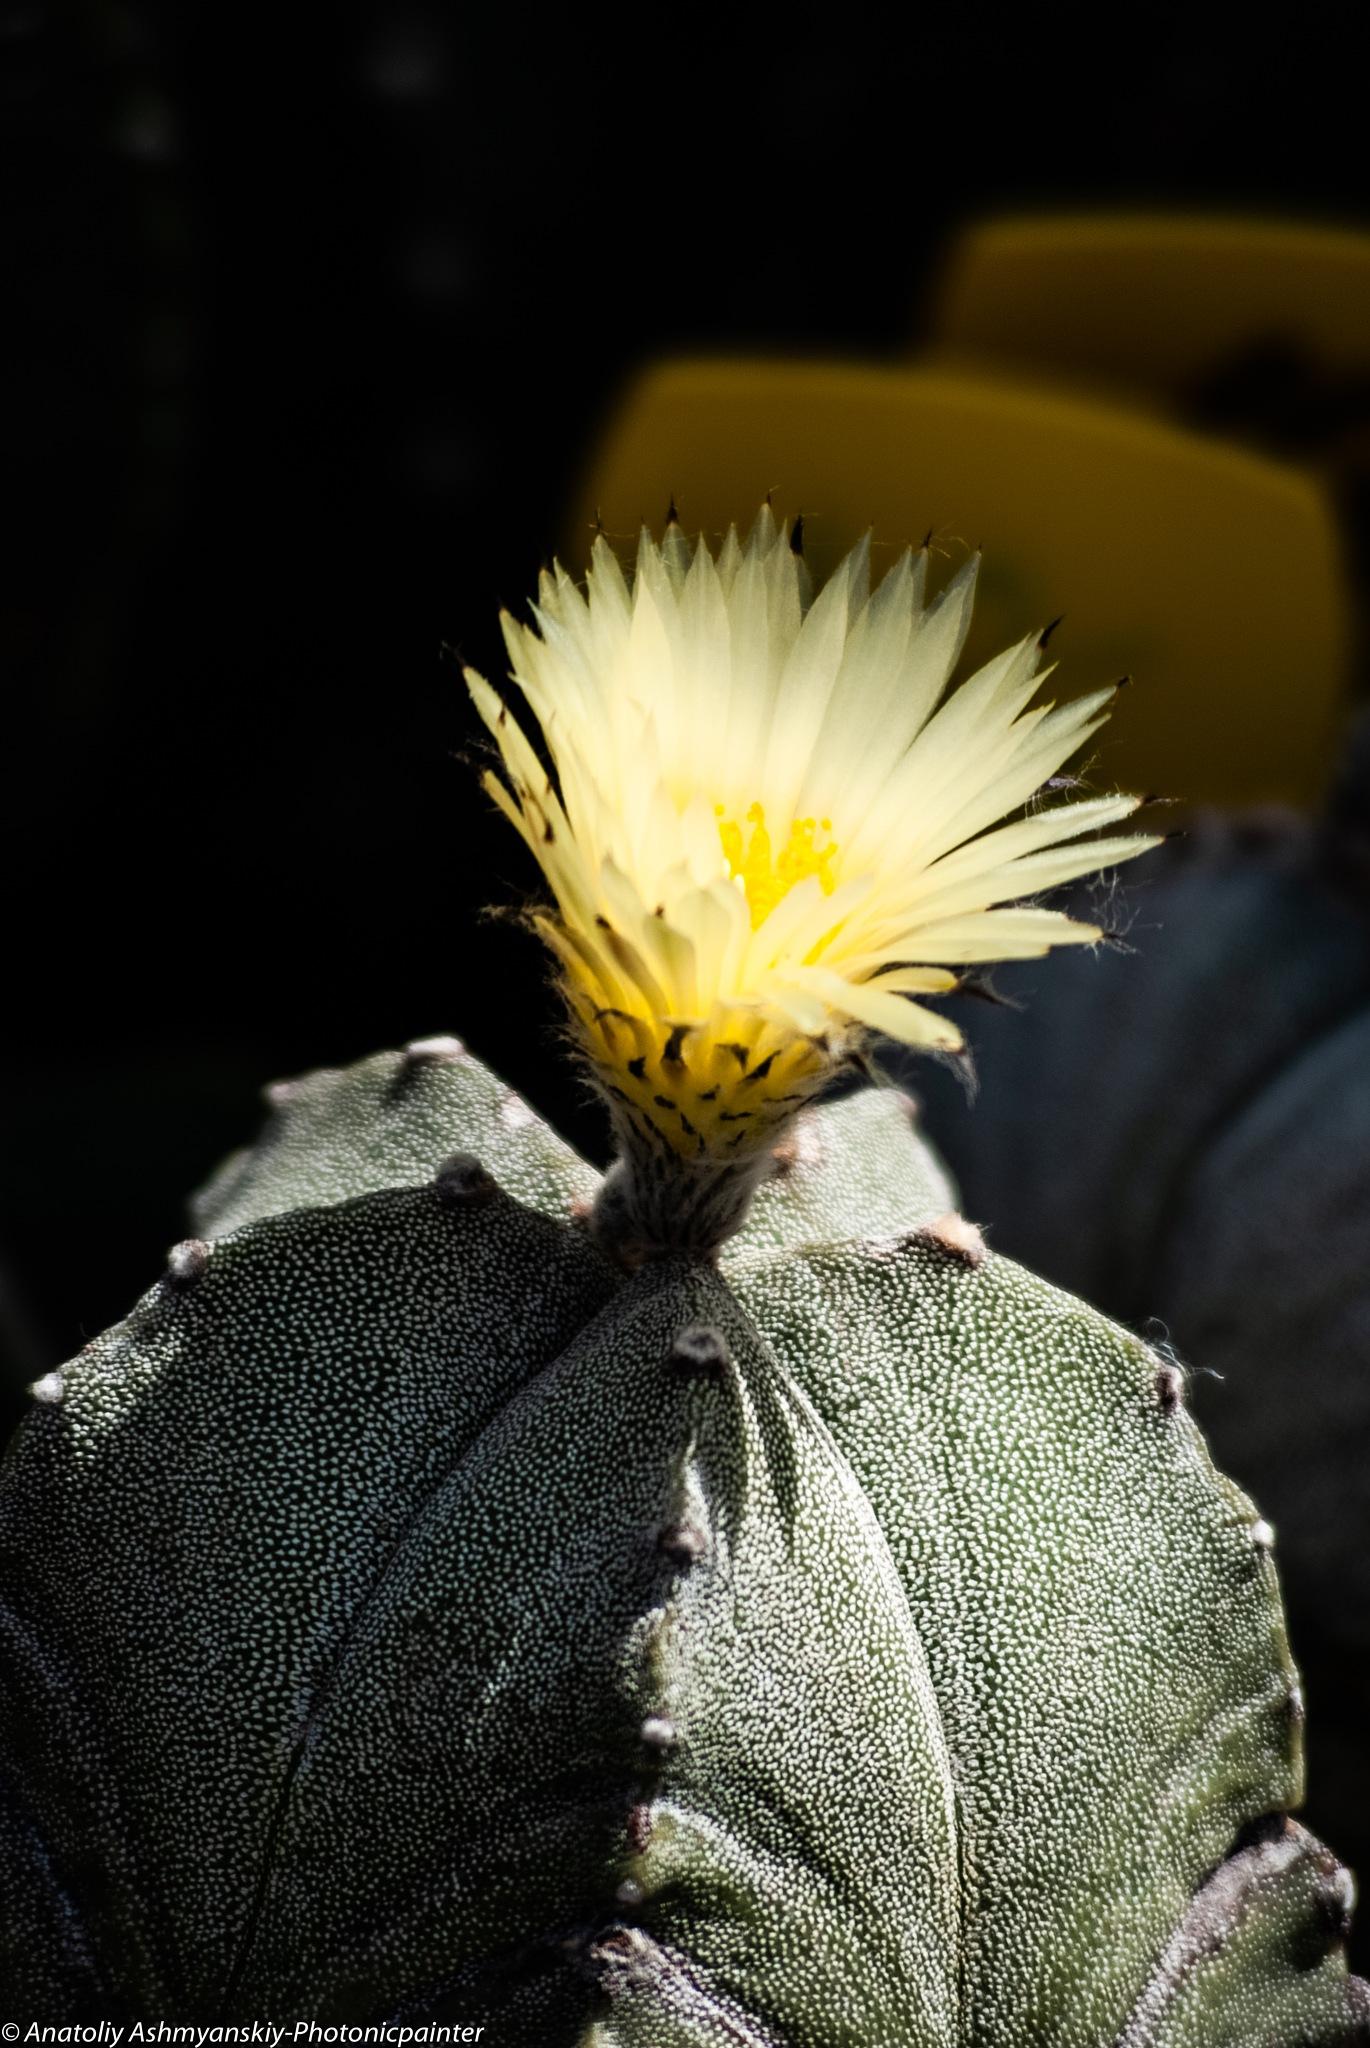 Cactus by Anatoliy Ashmyanskiy